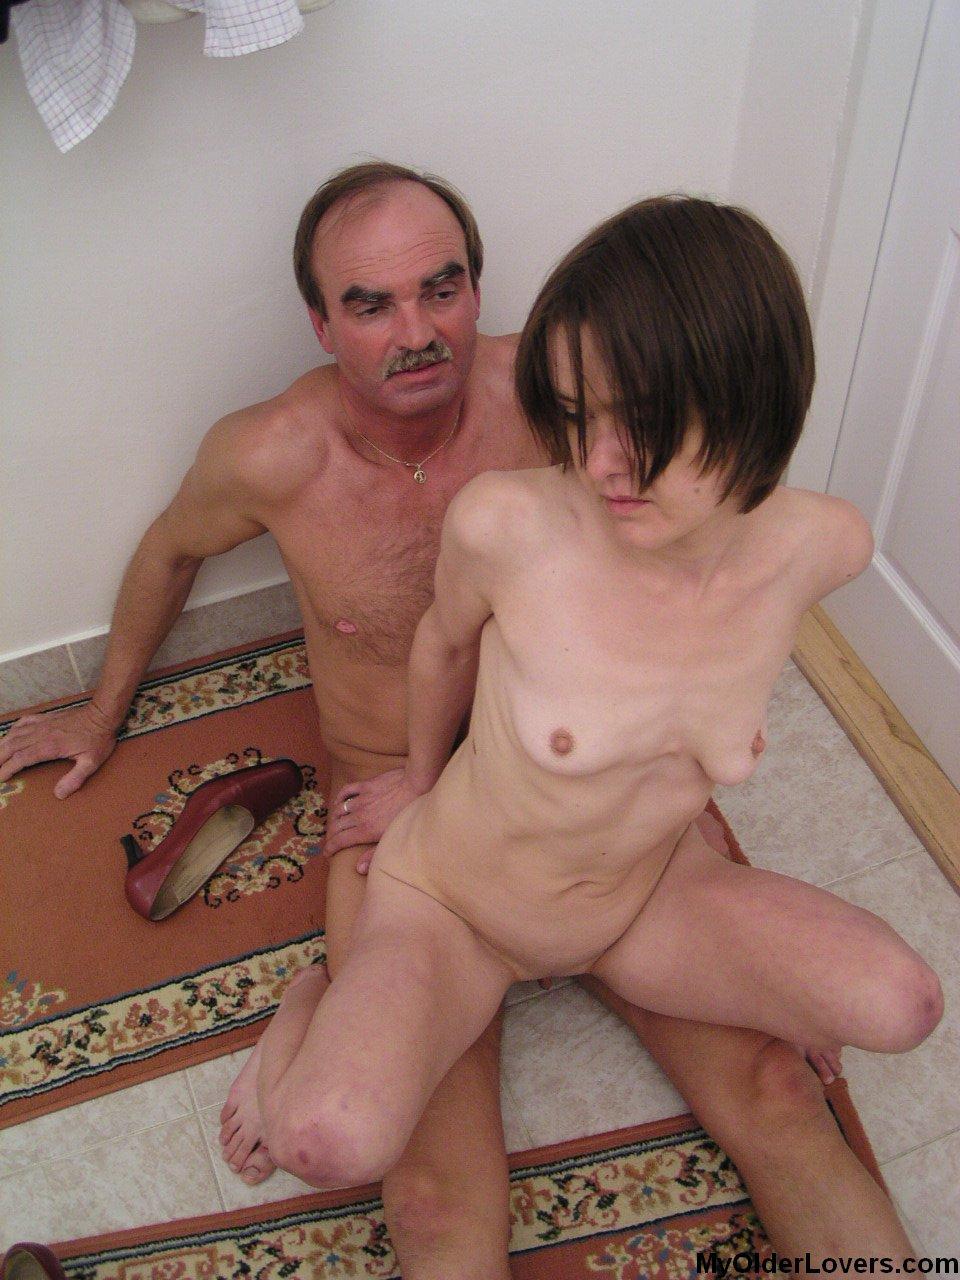 Тетя с сыном фото инцест 9 фотография